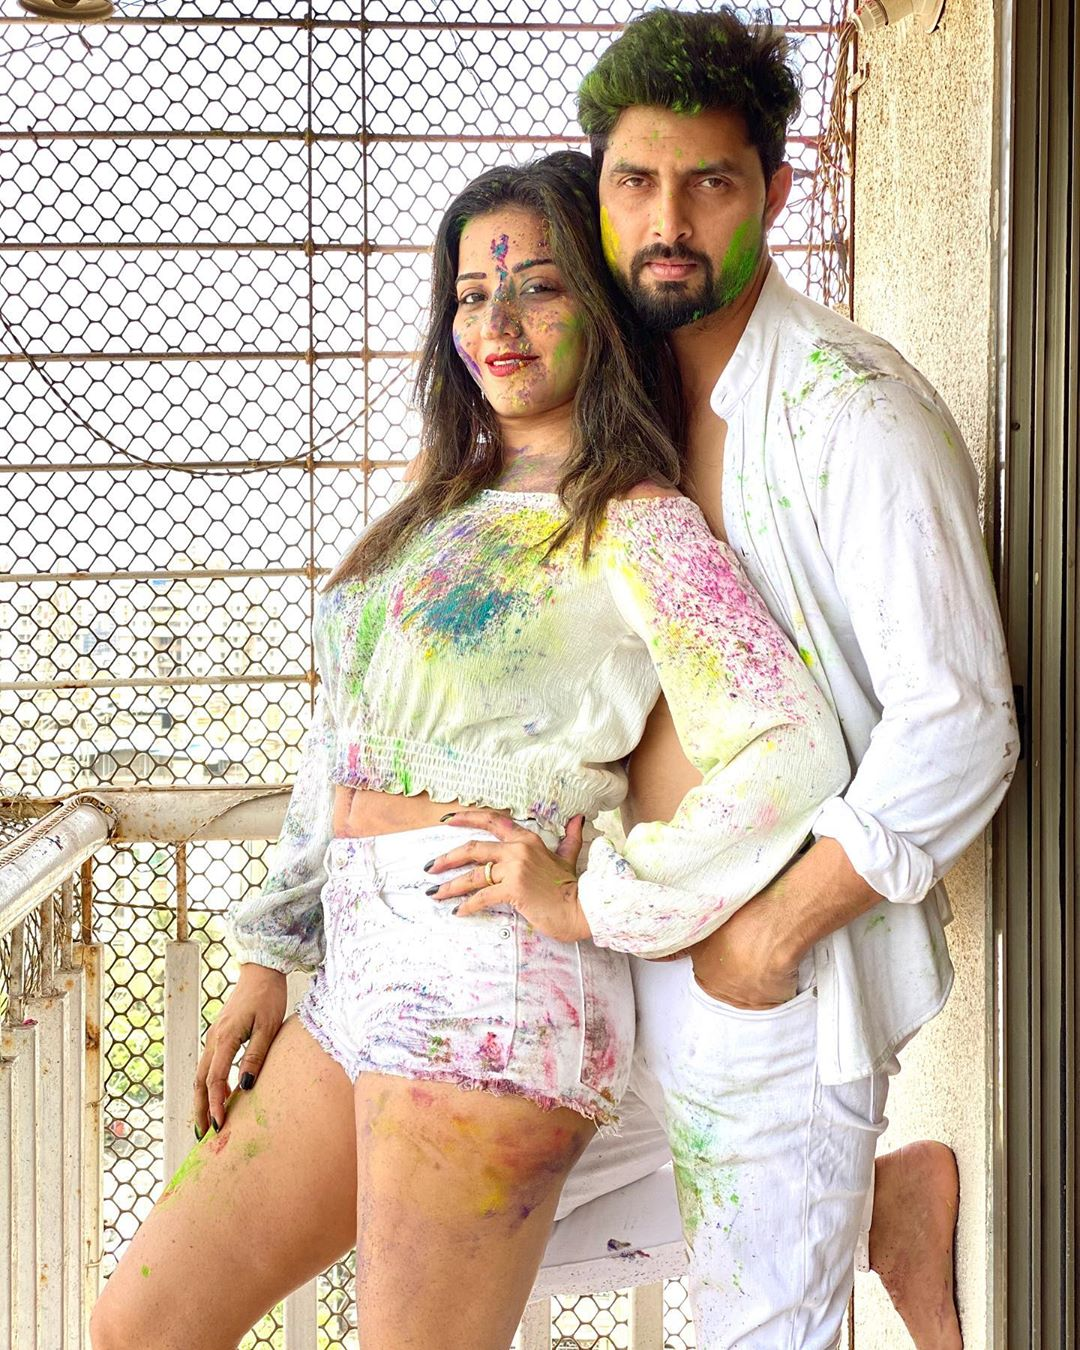 monalisa-and-vikrant-singh-rajput-romance-hot-pics